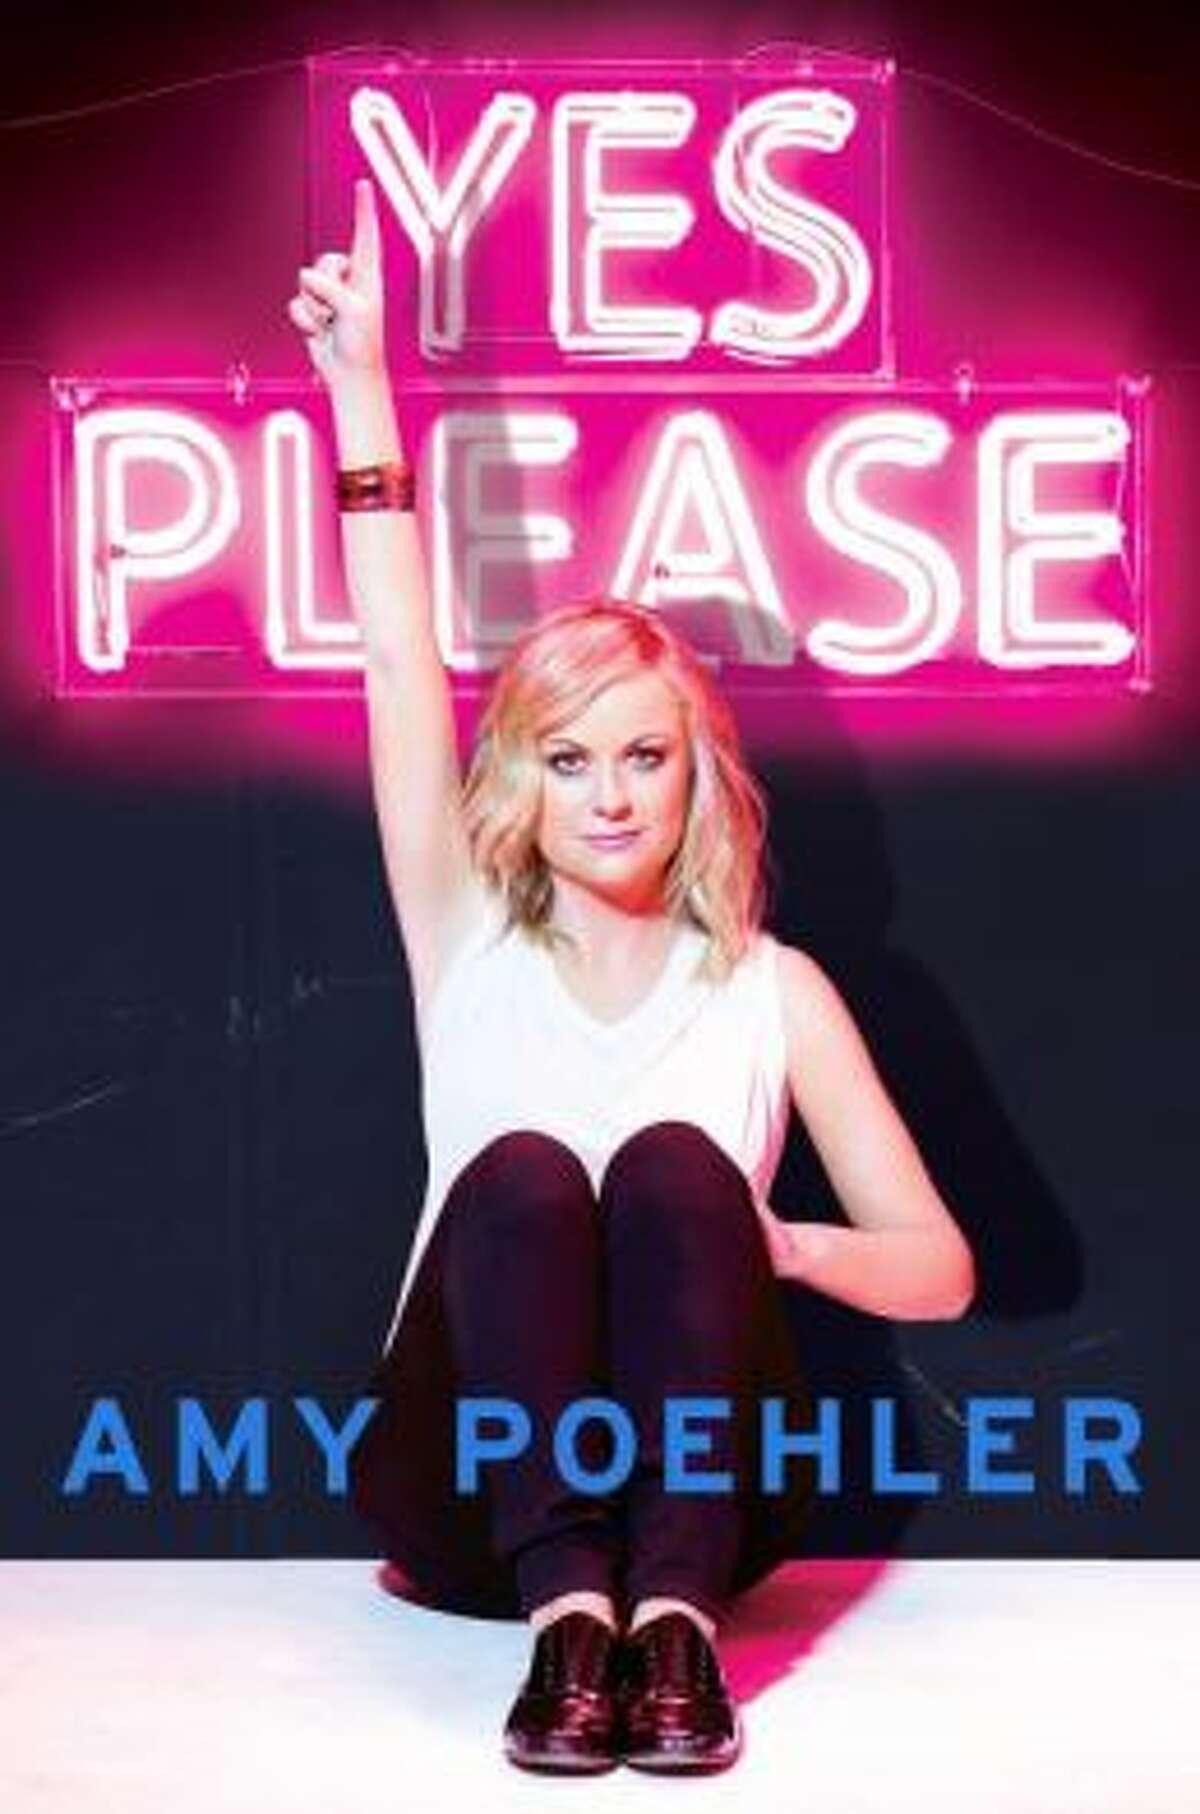 Amy Poehler: